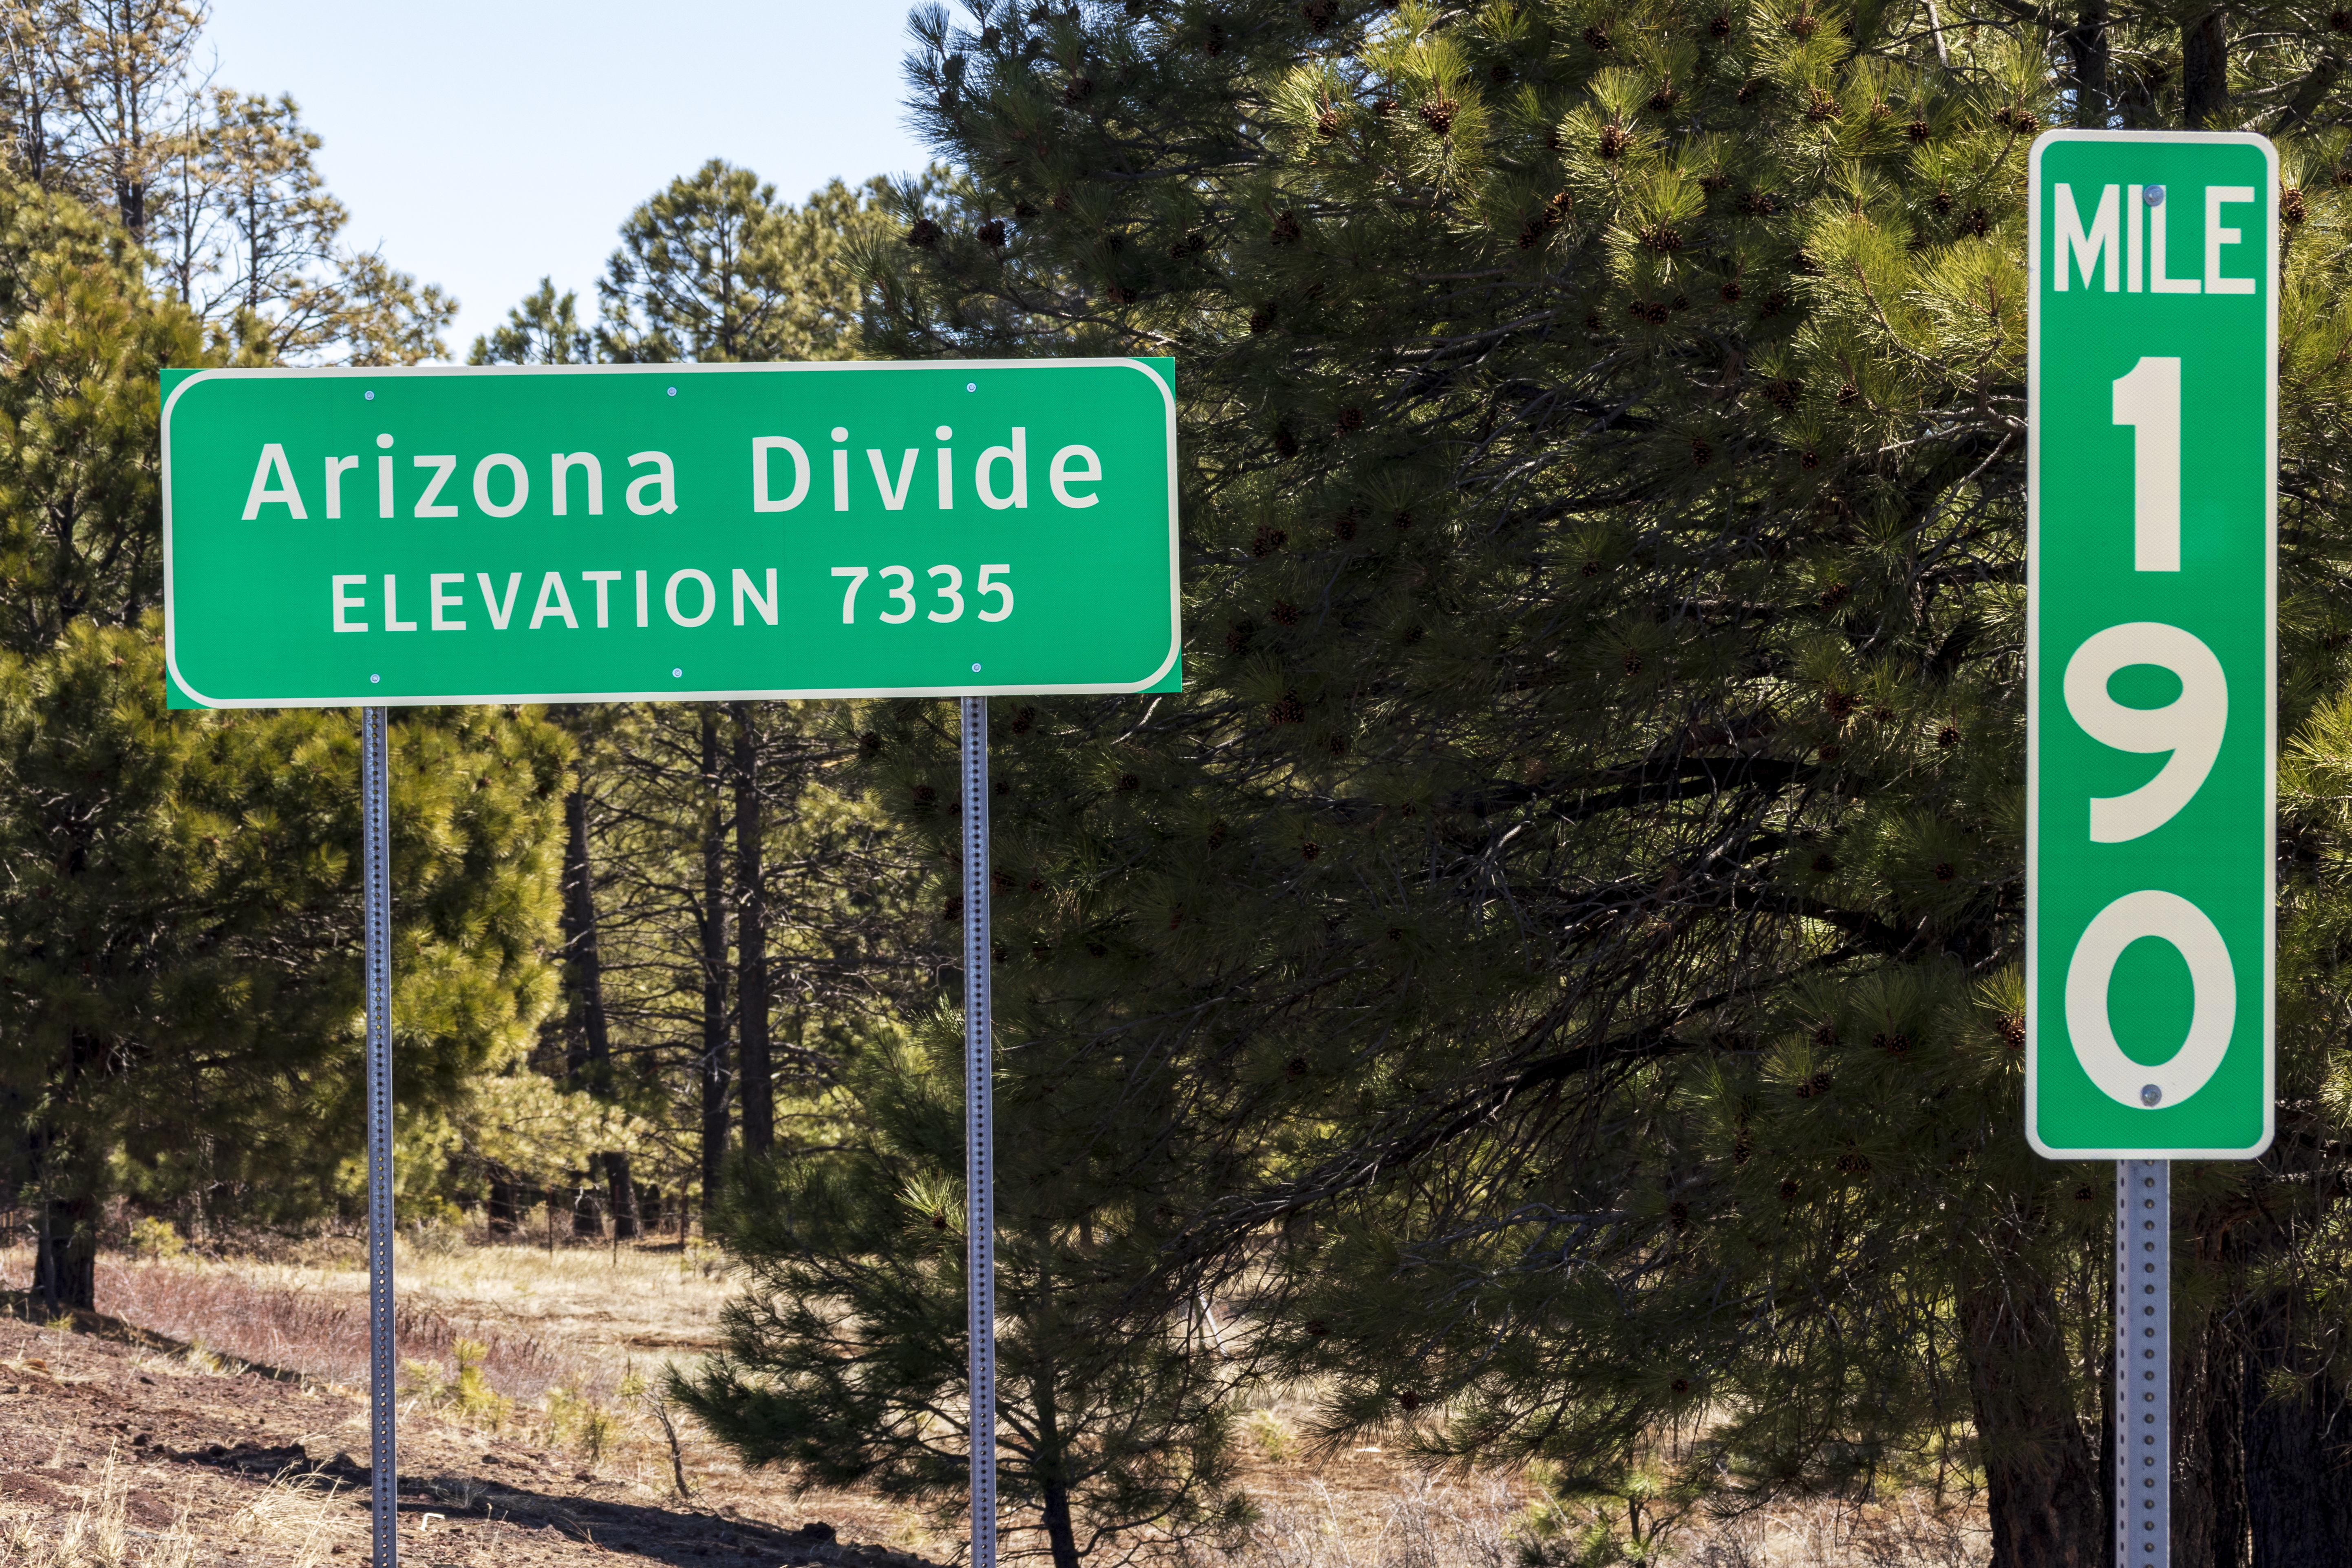 Interstate 40 Arizona Divide